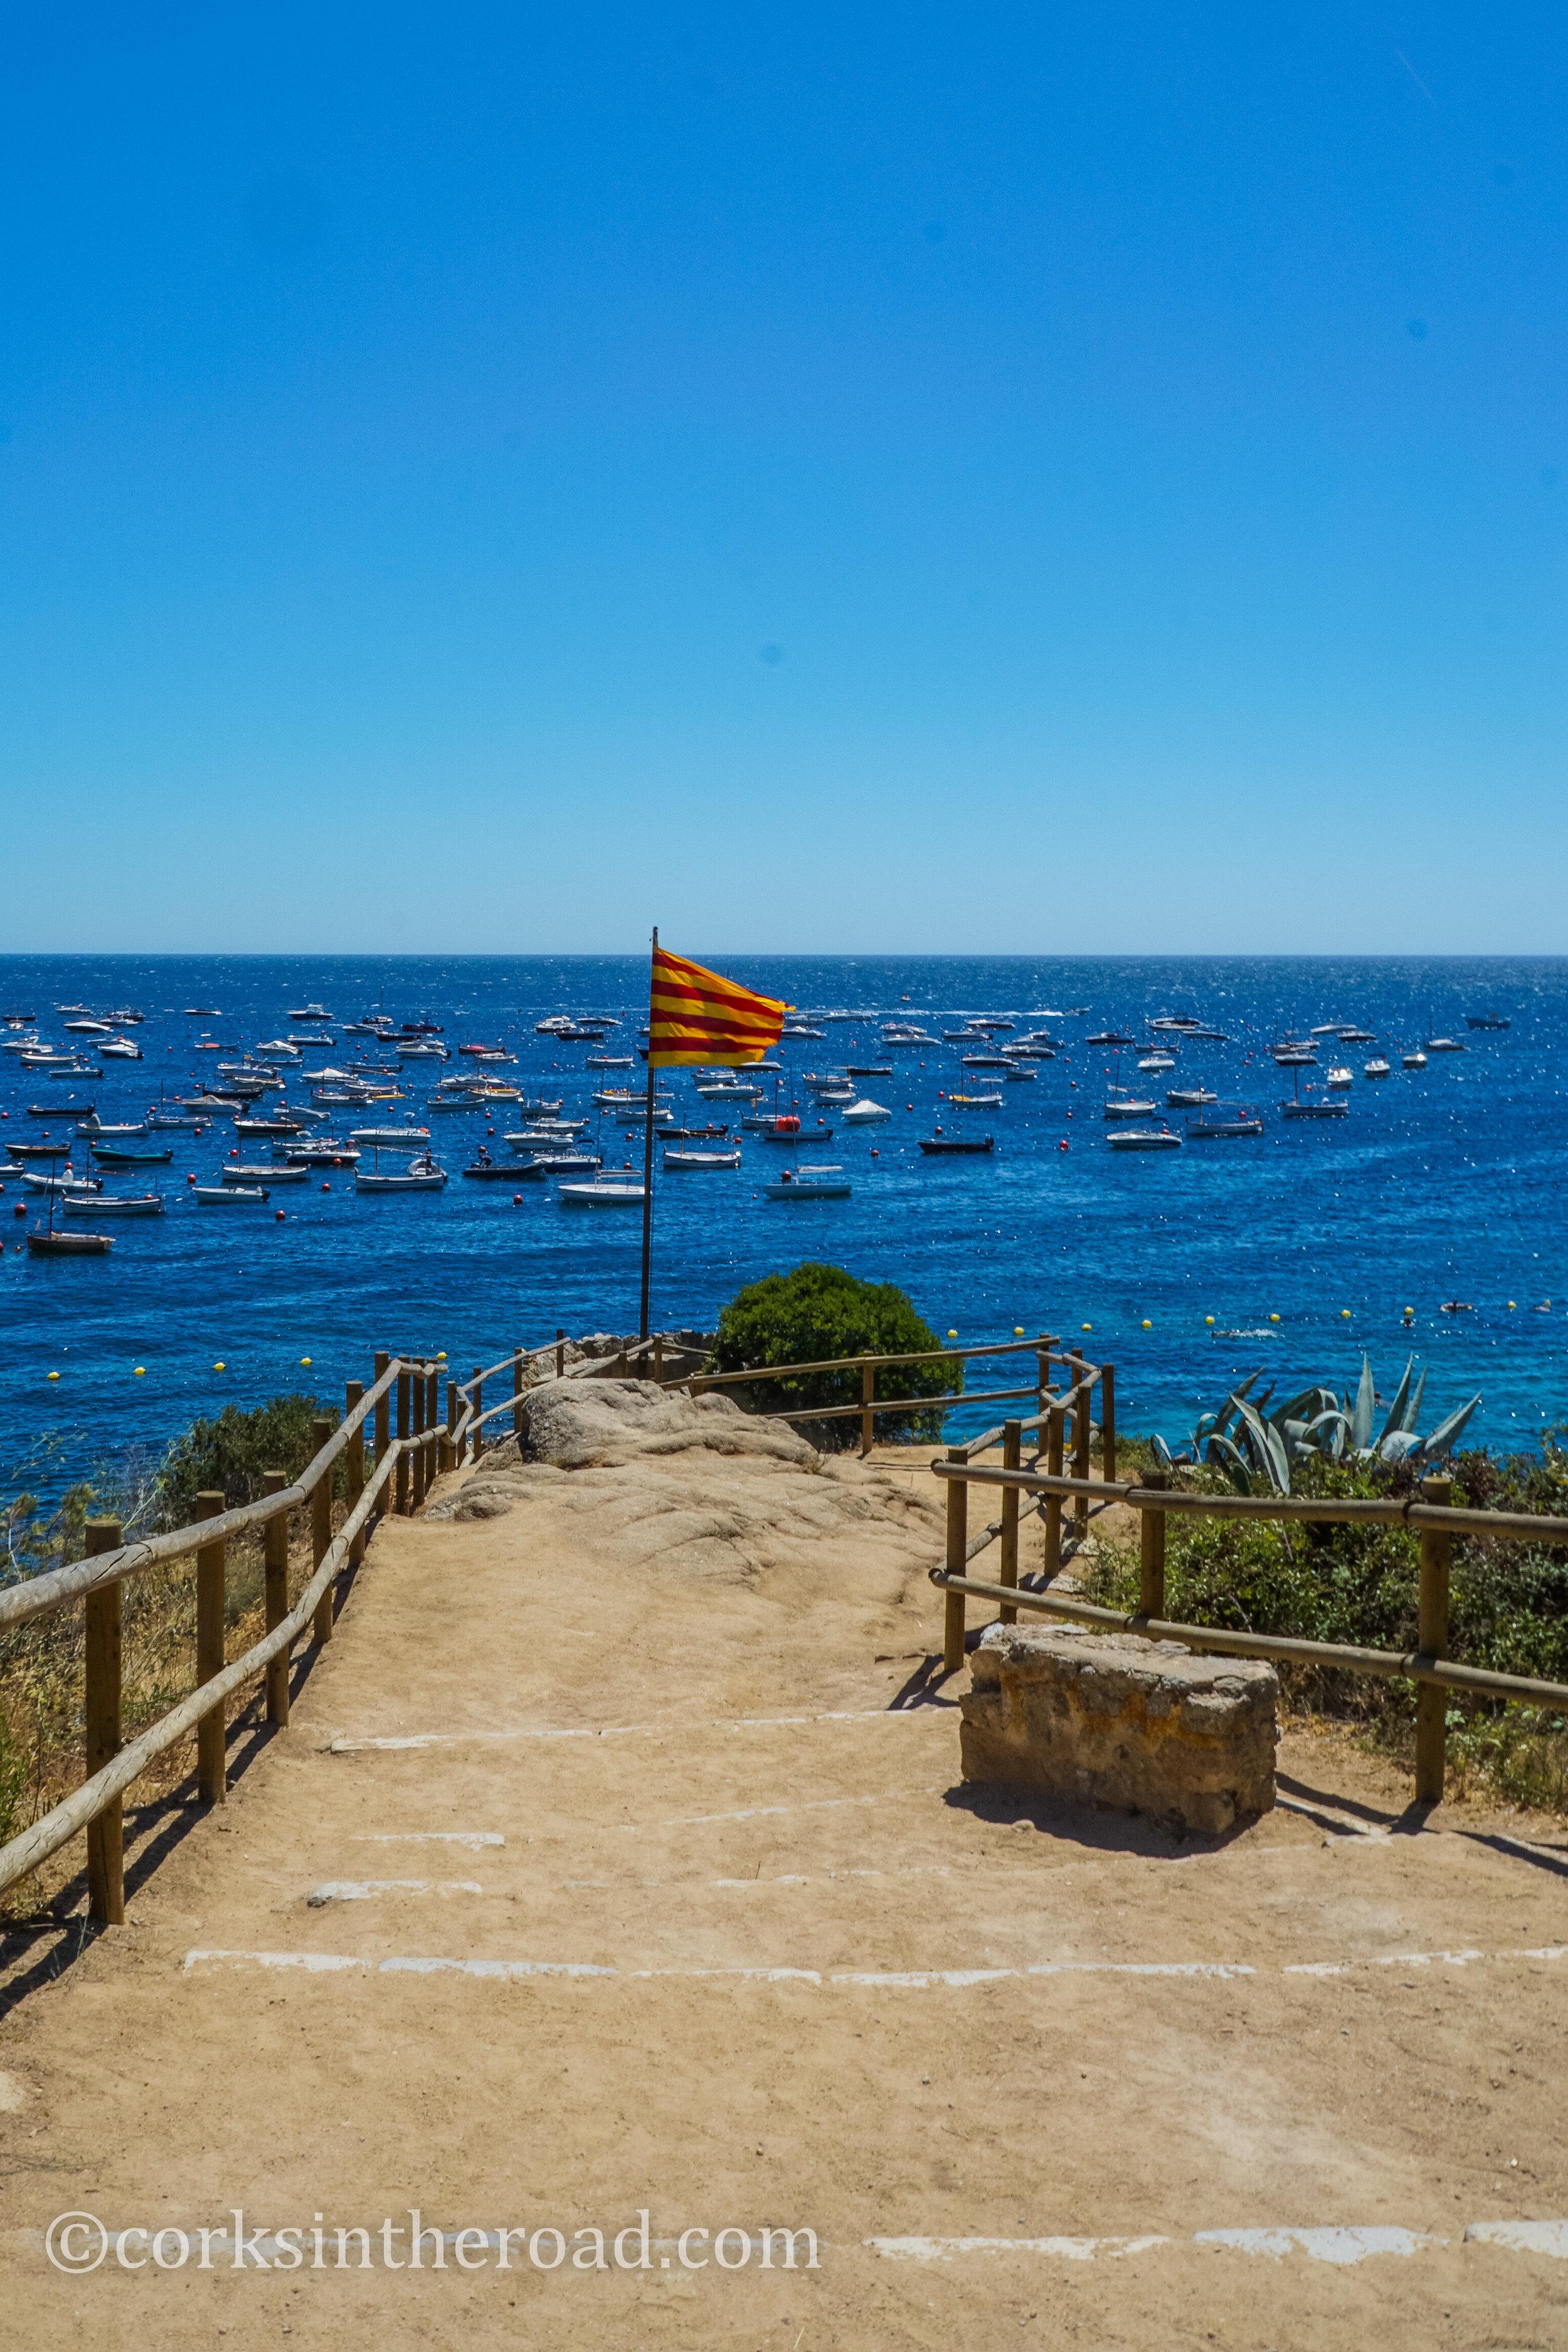 20160807Barcelona, Beaches, Corksintheroad, Costa Brava, Costa Brava Landscape-3.jpg